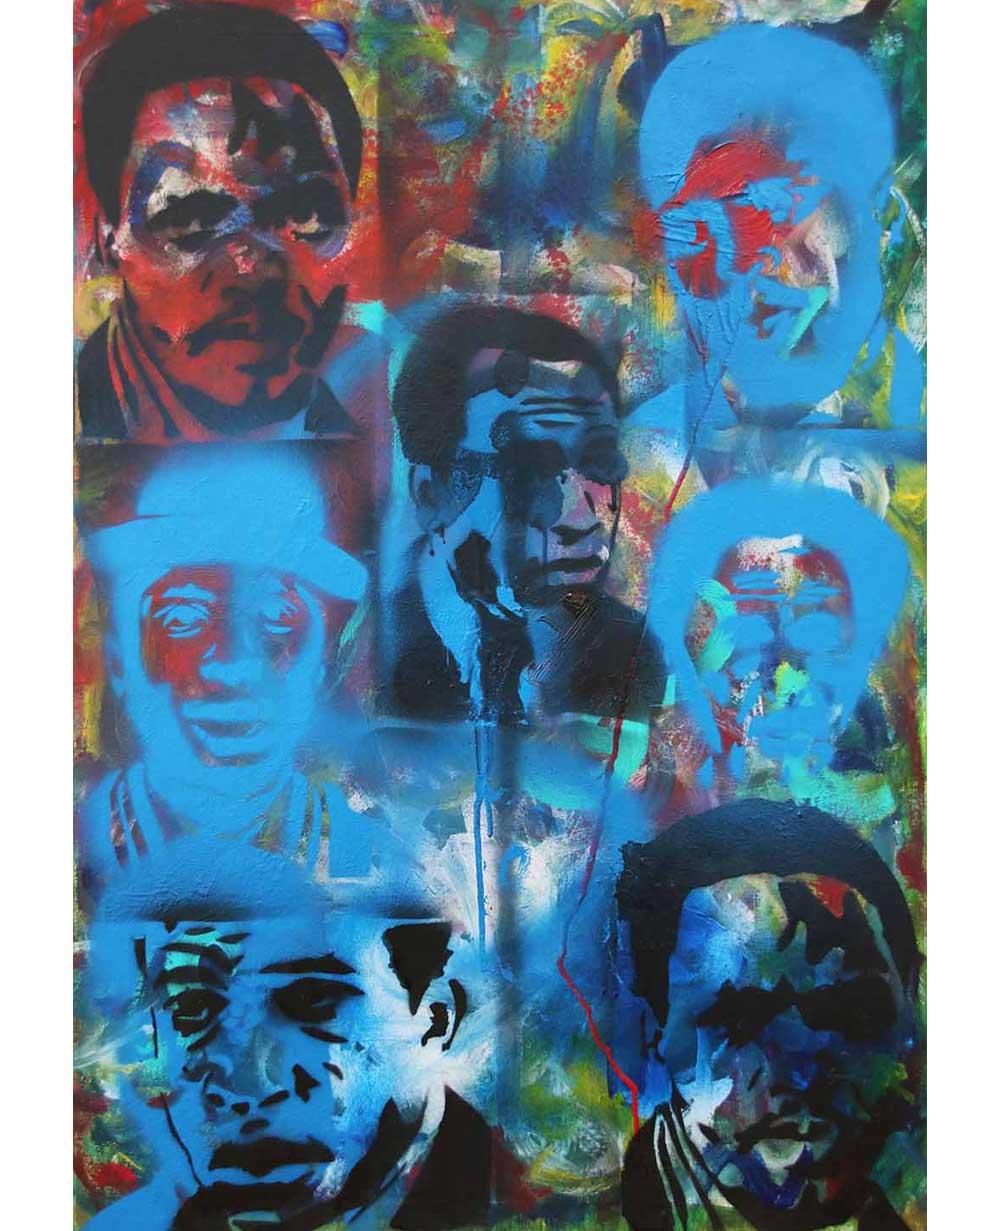 Gulwa Lindisipho Tribute to Biko 2019 mixed media on canvas 60 x 84 cm